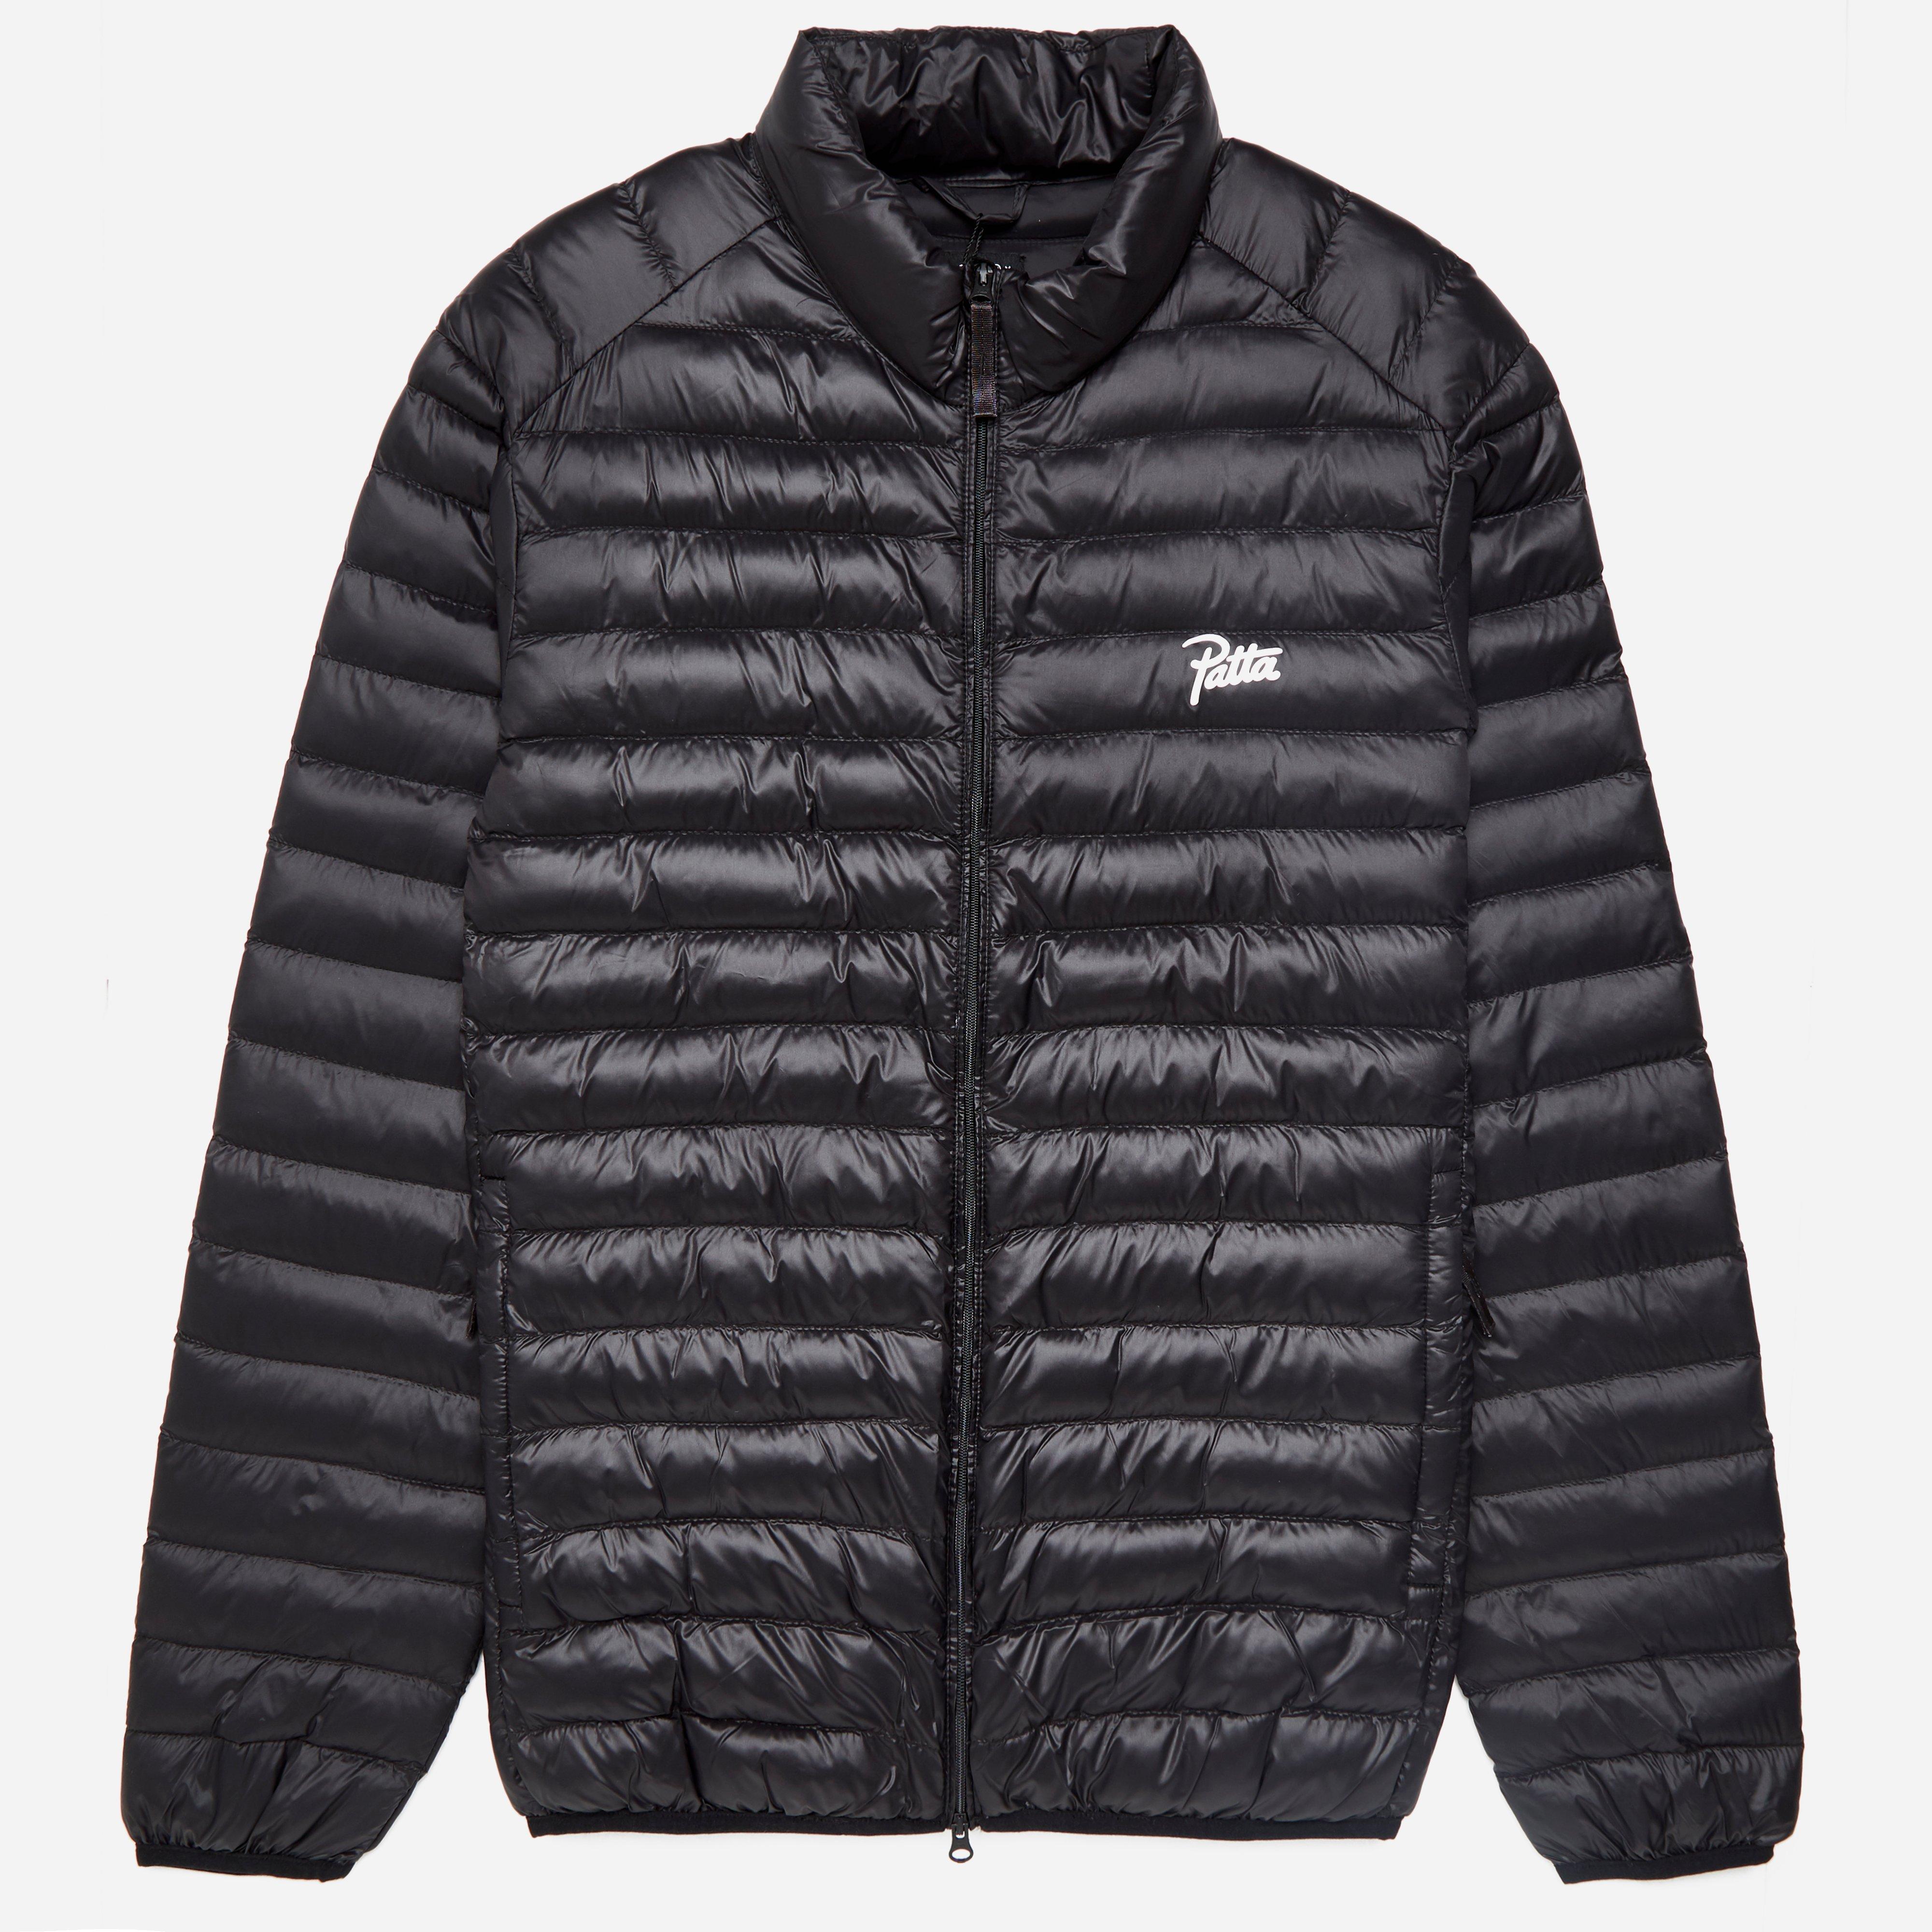 Patta Label Light Insulated Jacket